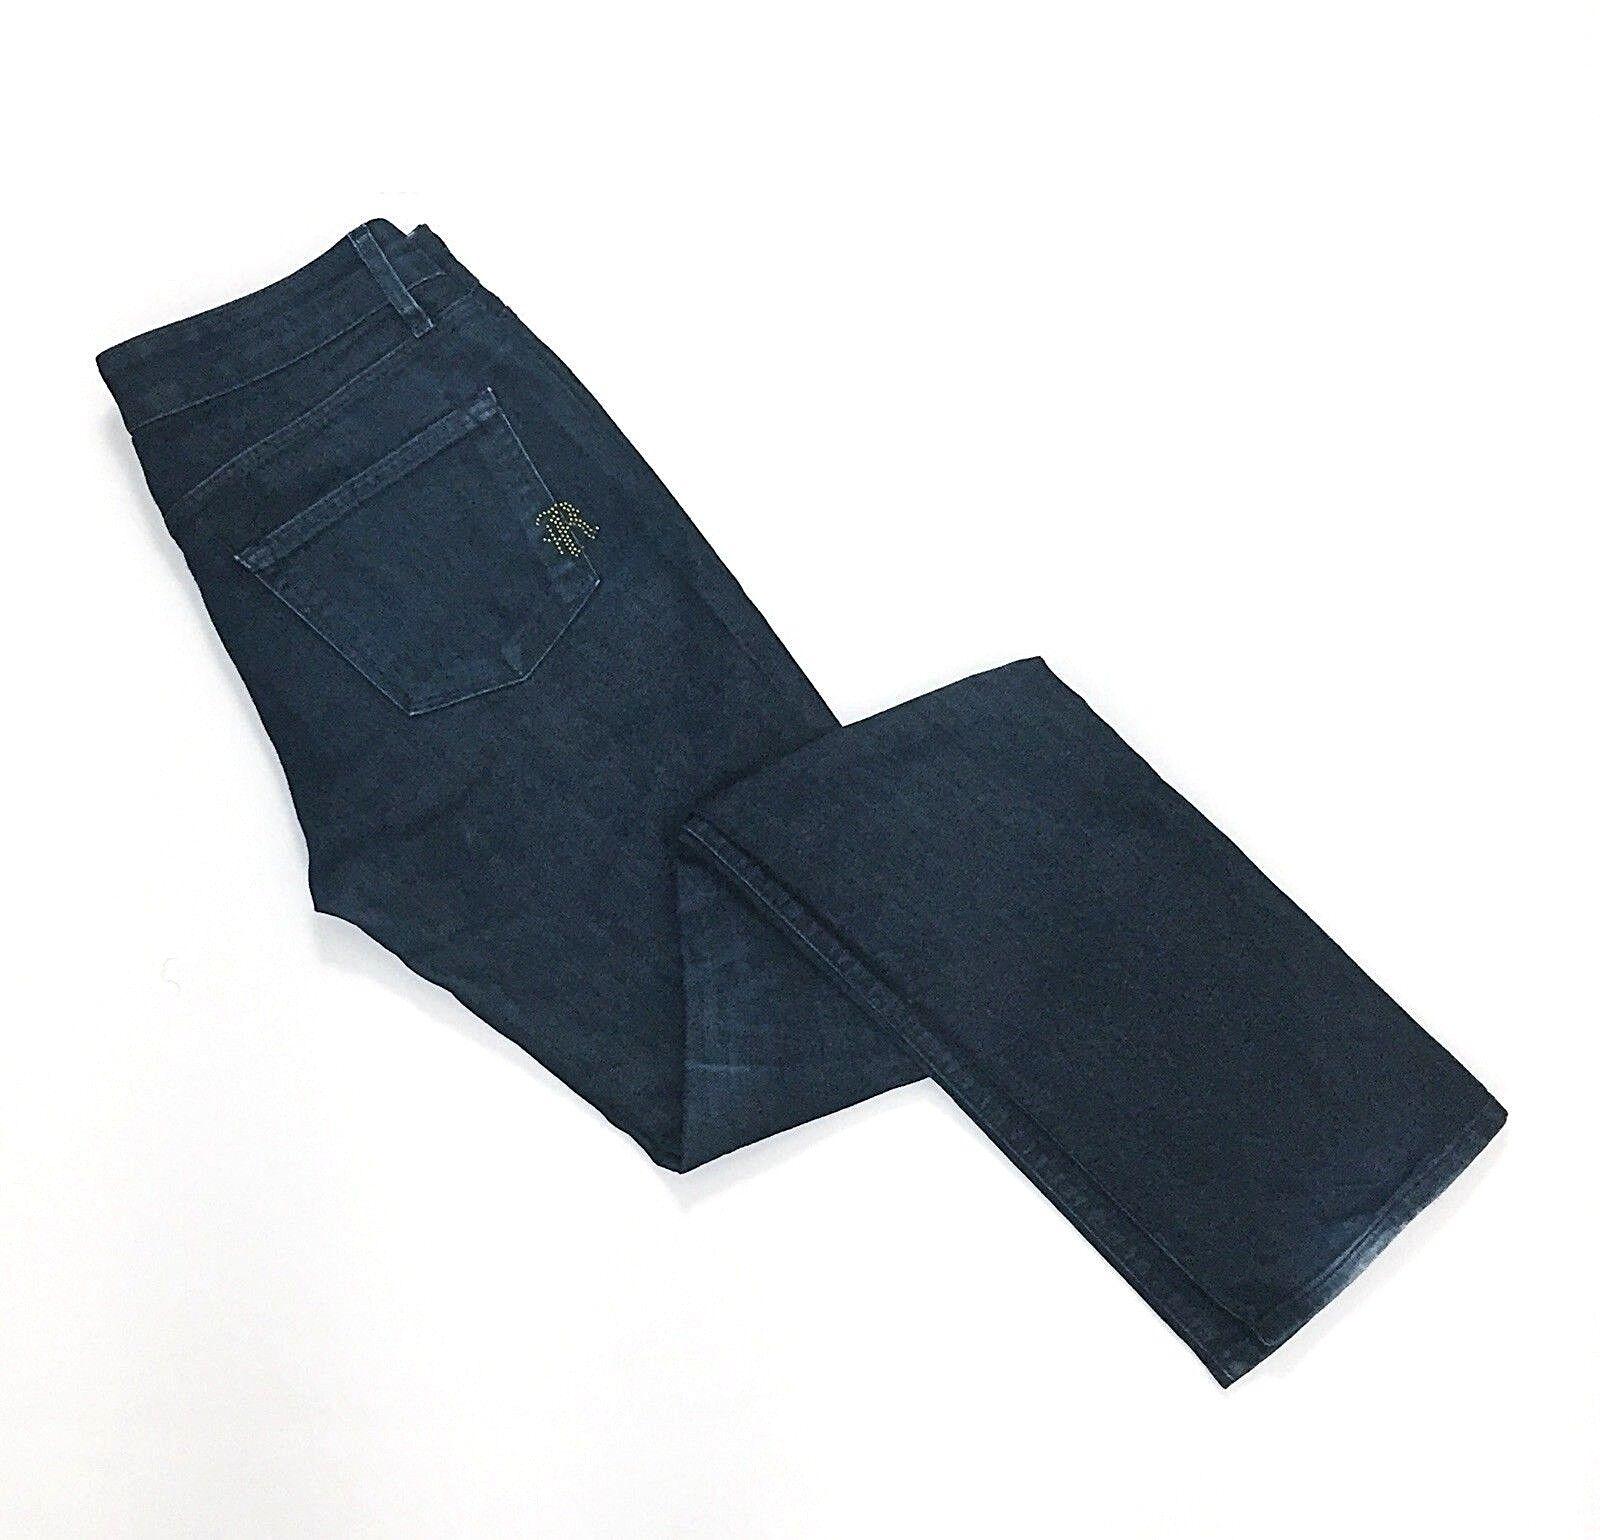 Rich and Skinny Stretch Dark Wash Womens Jeans. Sz. 26. Fits 30x32